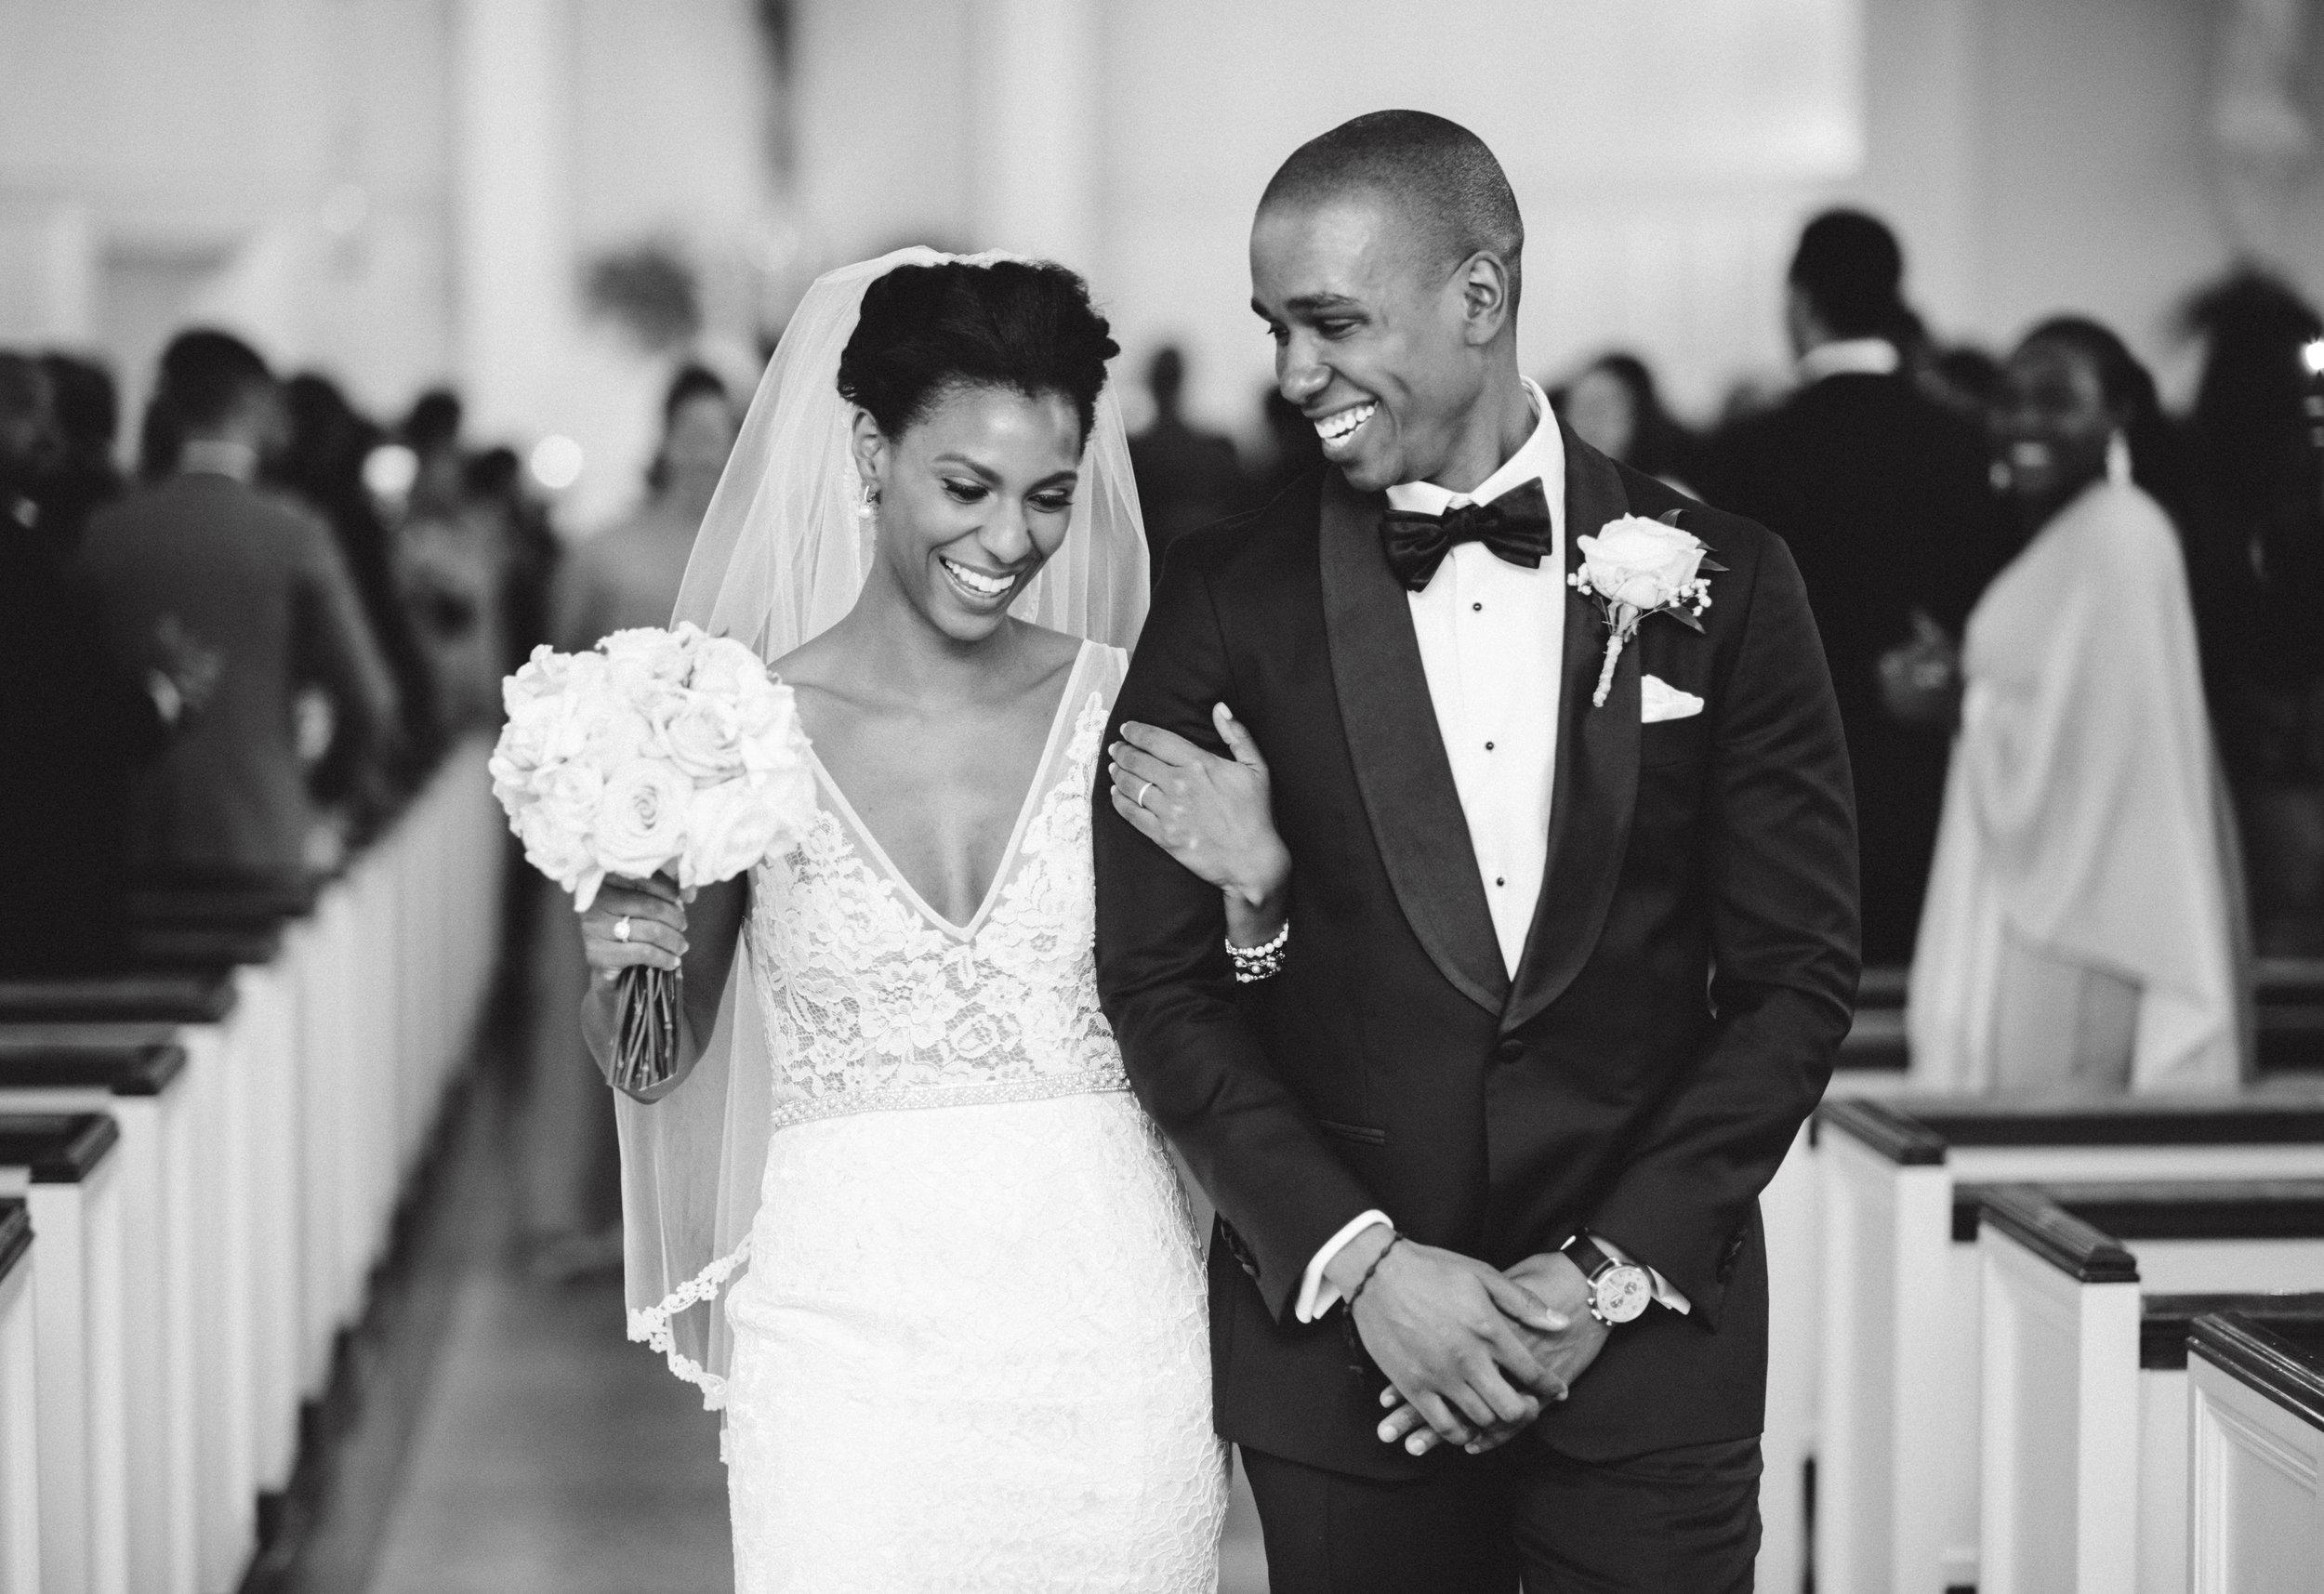 DANIELLE & BRANDON WEDDING - HEDGE ART GALLERY - NYC INTIMATE WEDDING PHOTOGRAPHER - CHI-CHI ARI-231.jpg